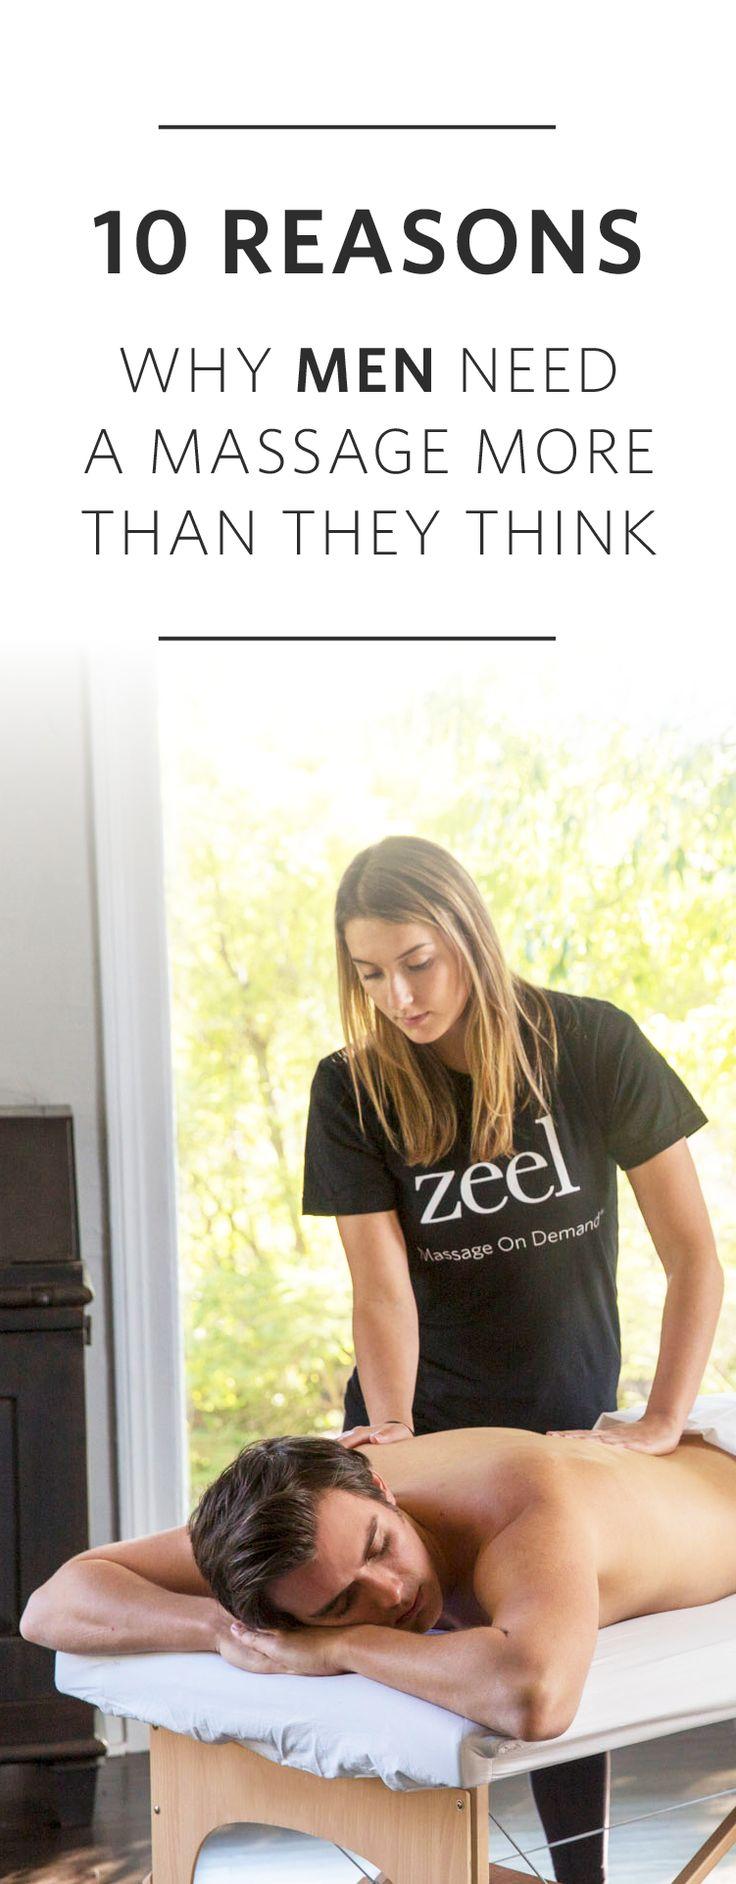 2019 year for women- We zeels it tried massage delivery service